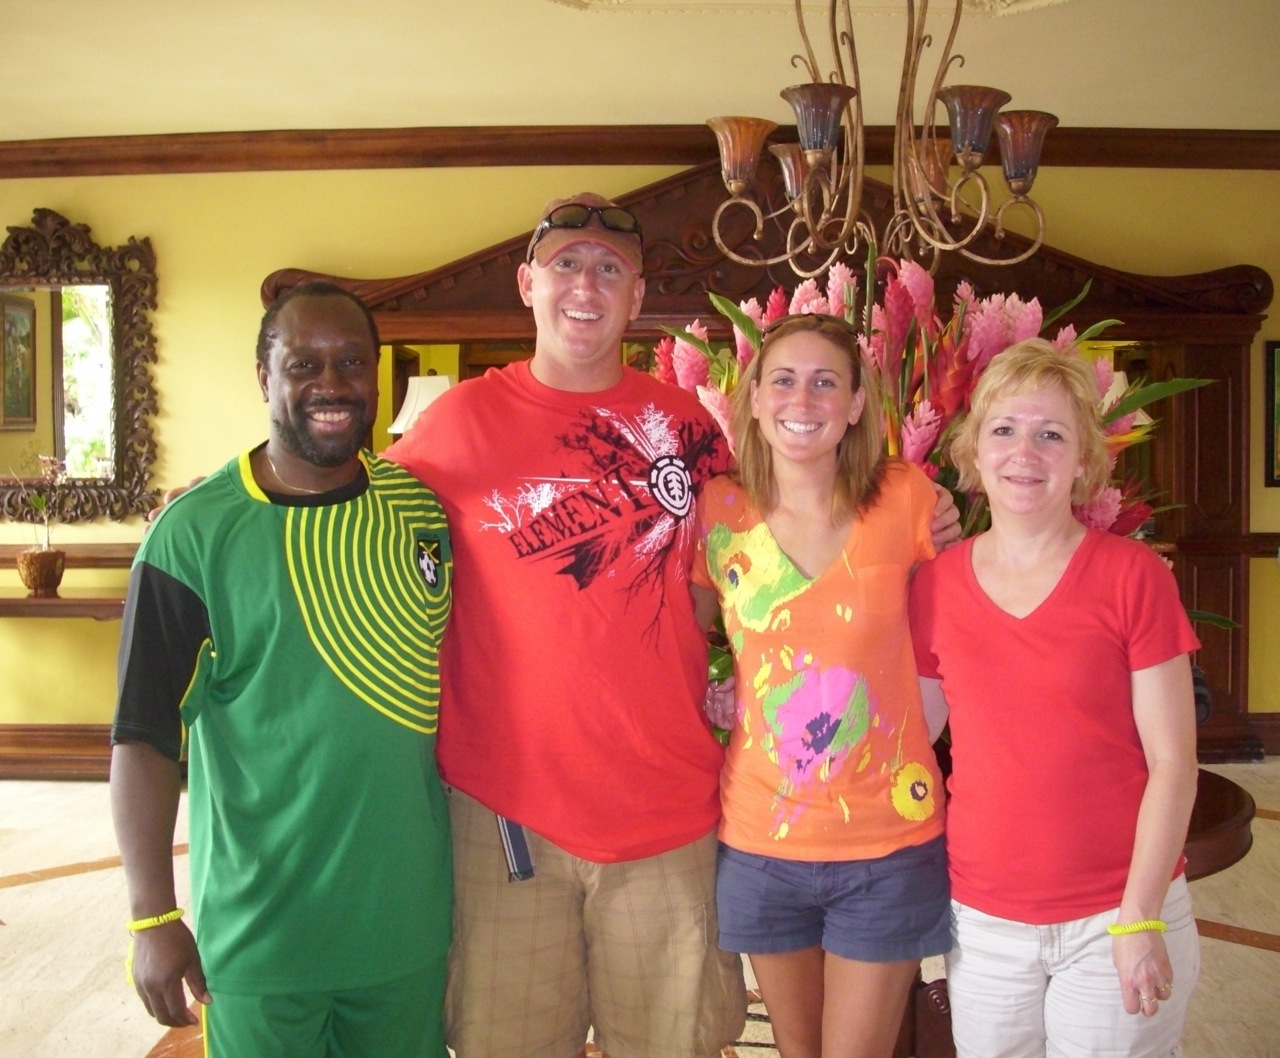 http://2.bp.blogspot.com/_fFdVM7HJmkk/S8zCclWZmnI/AAAAAAAAAJY/9Pmnx35ZS5s/s1600/DSCI0484-Jamaica.jpg